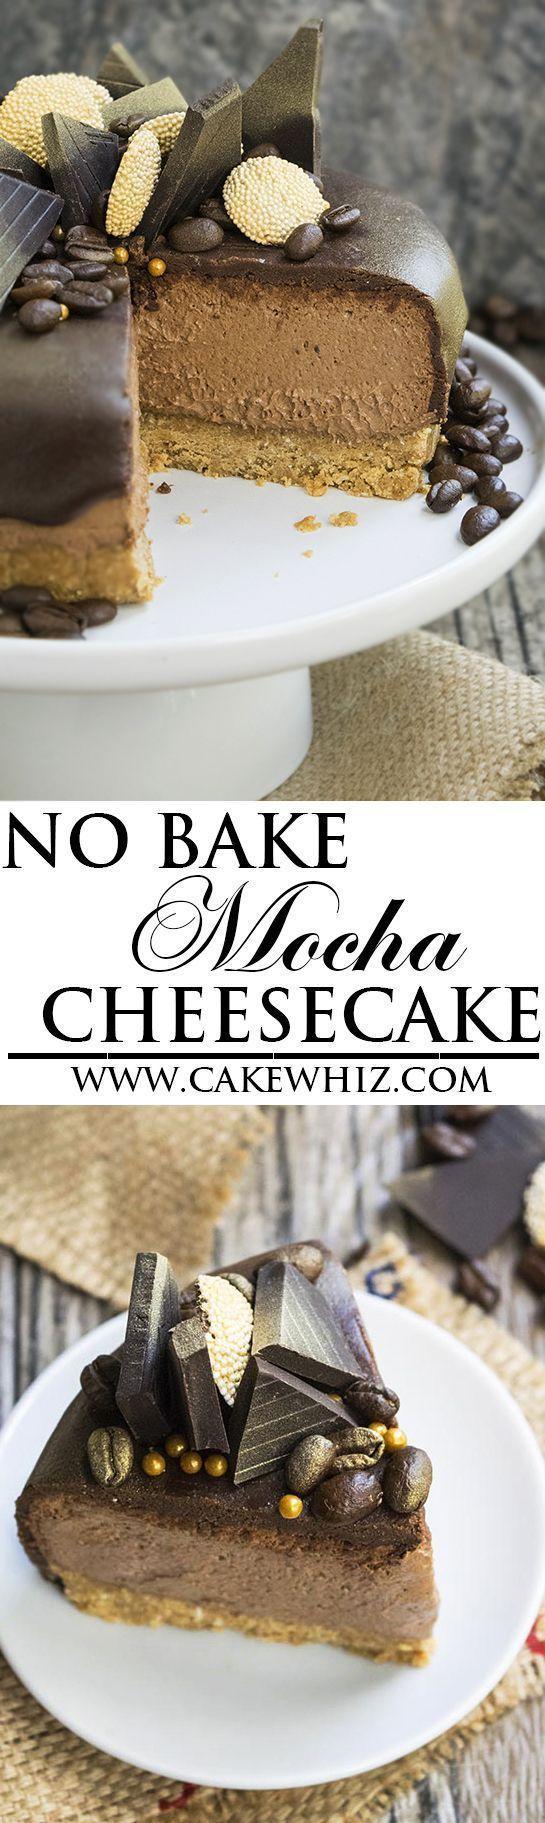 NO BAKE MOCHA CHEESECAKE